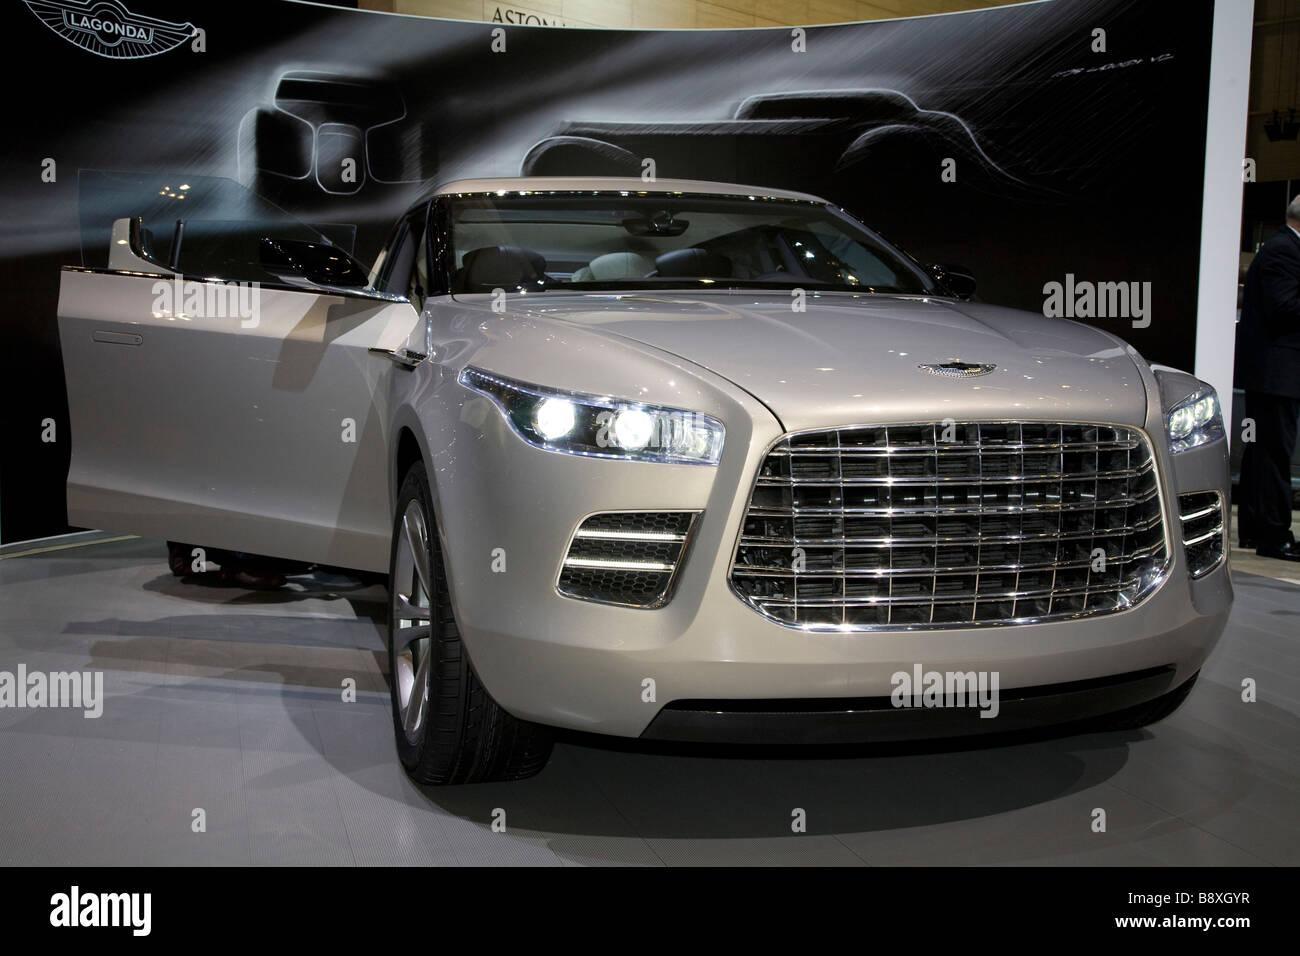 Aston Martin Lagonda shown at a European motor show. - Stock Image